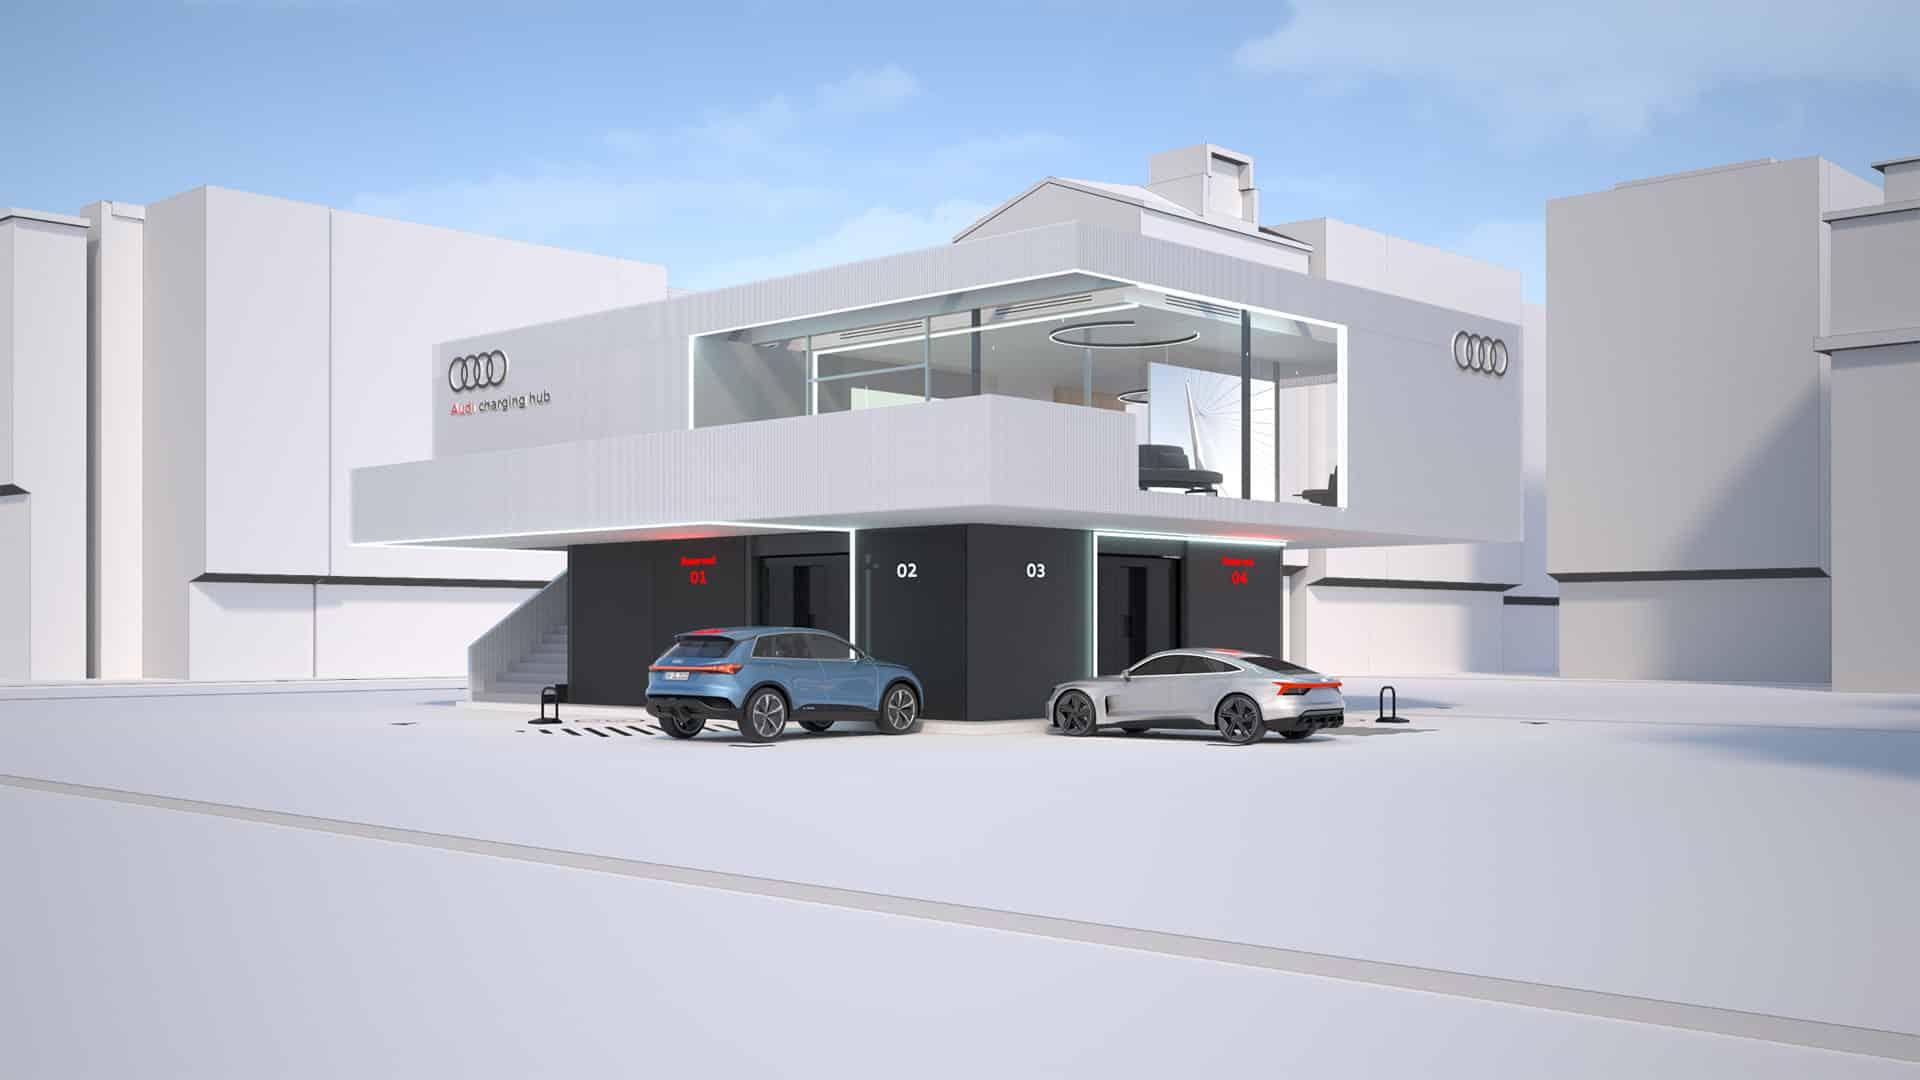 Audi prueba concepto de recarga rápida